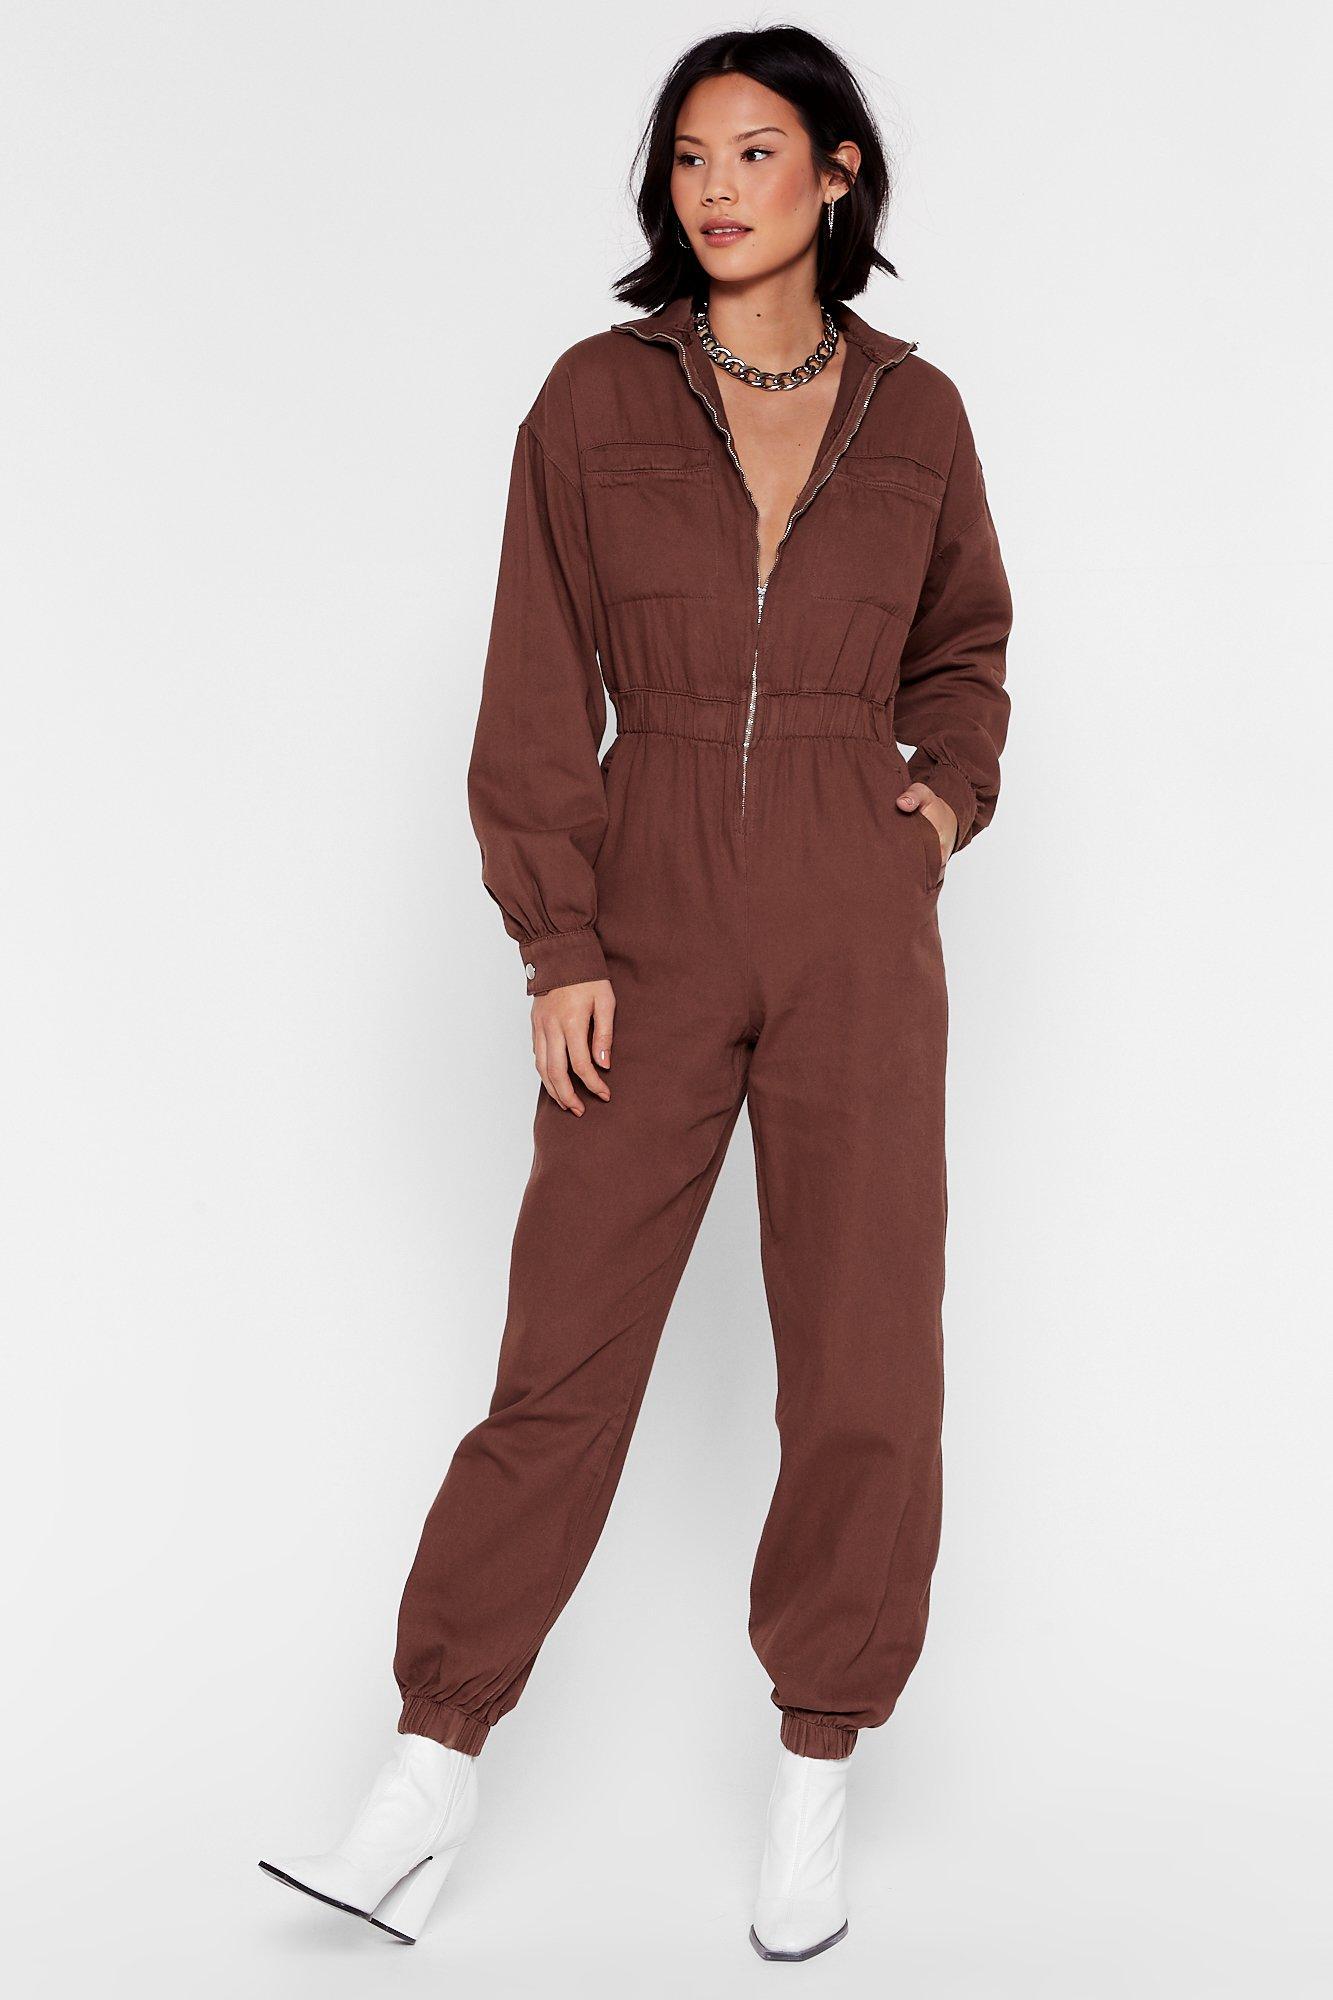 Image of Slip of the Zip Relaxed Denim Boilersuit